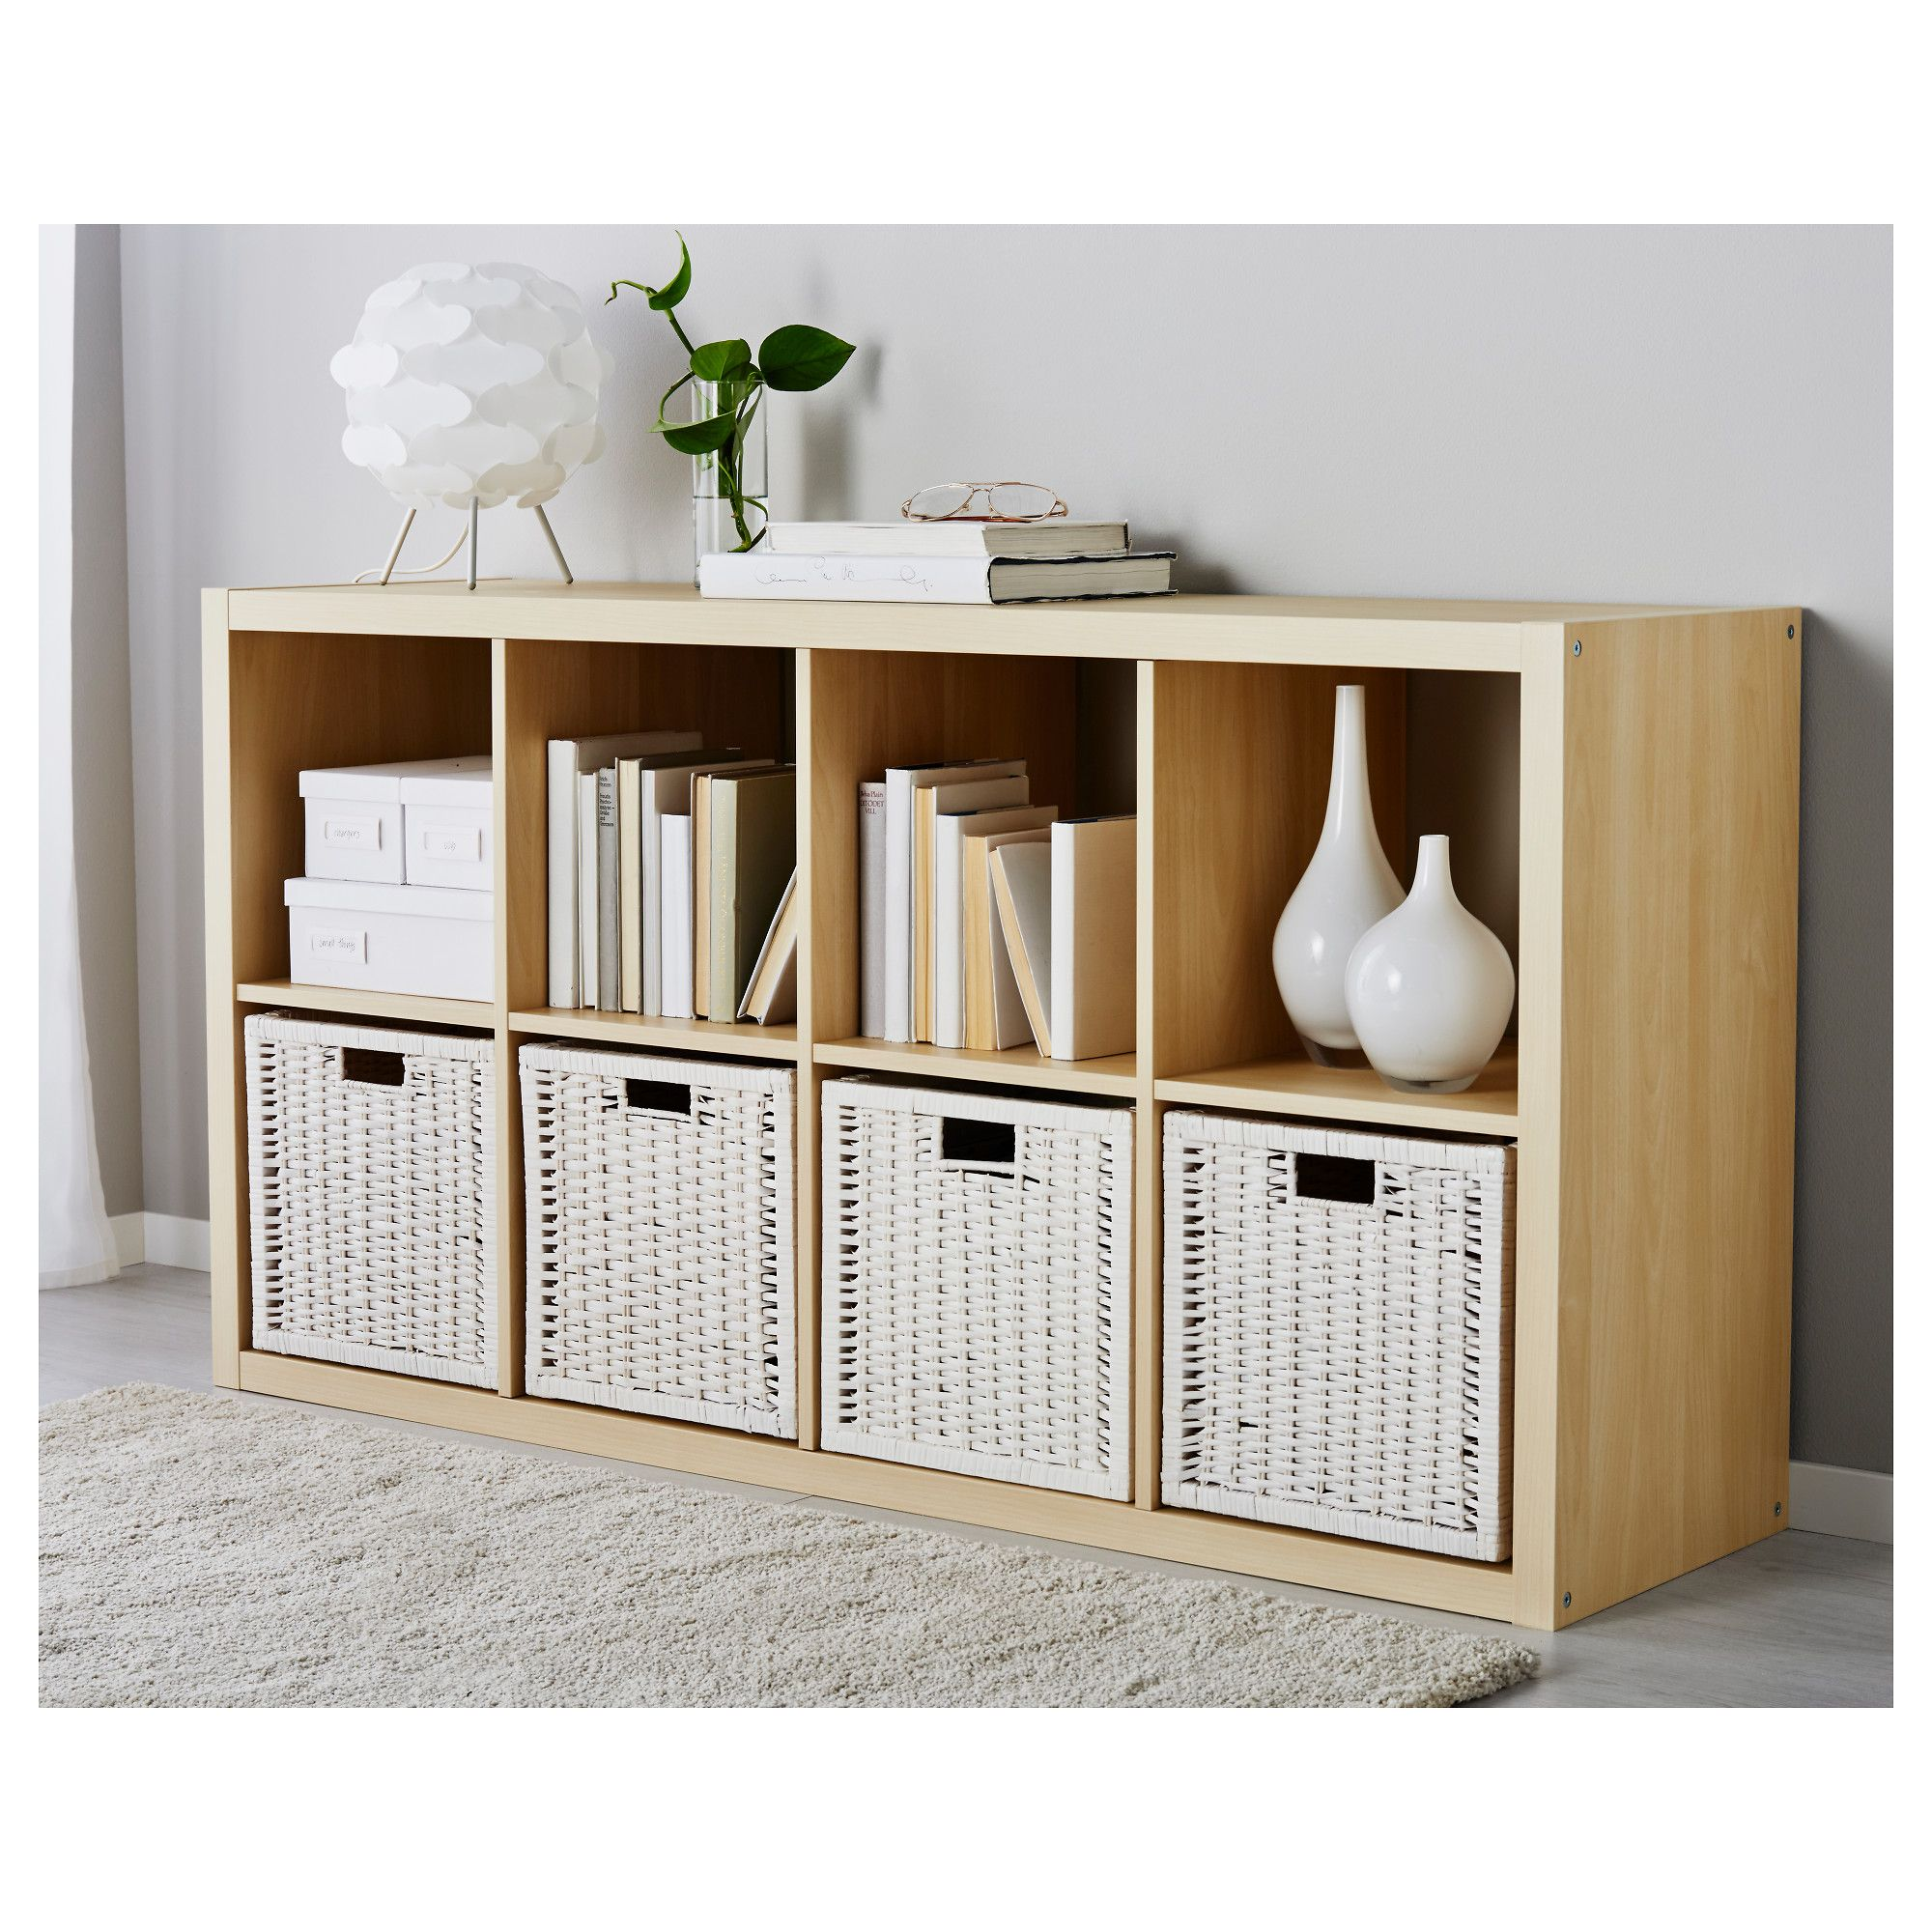 ikea bran s basket white products in 2019 kallax. Black Bedroom Furniture Sets. Home Design Ideas